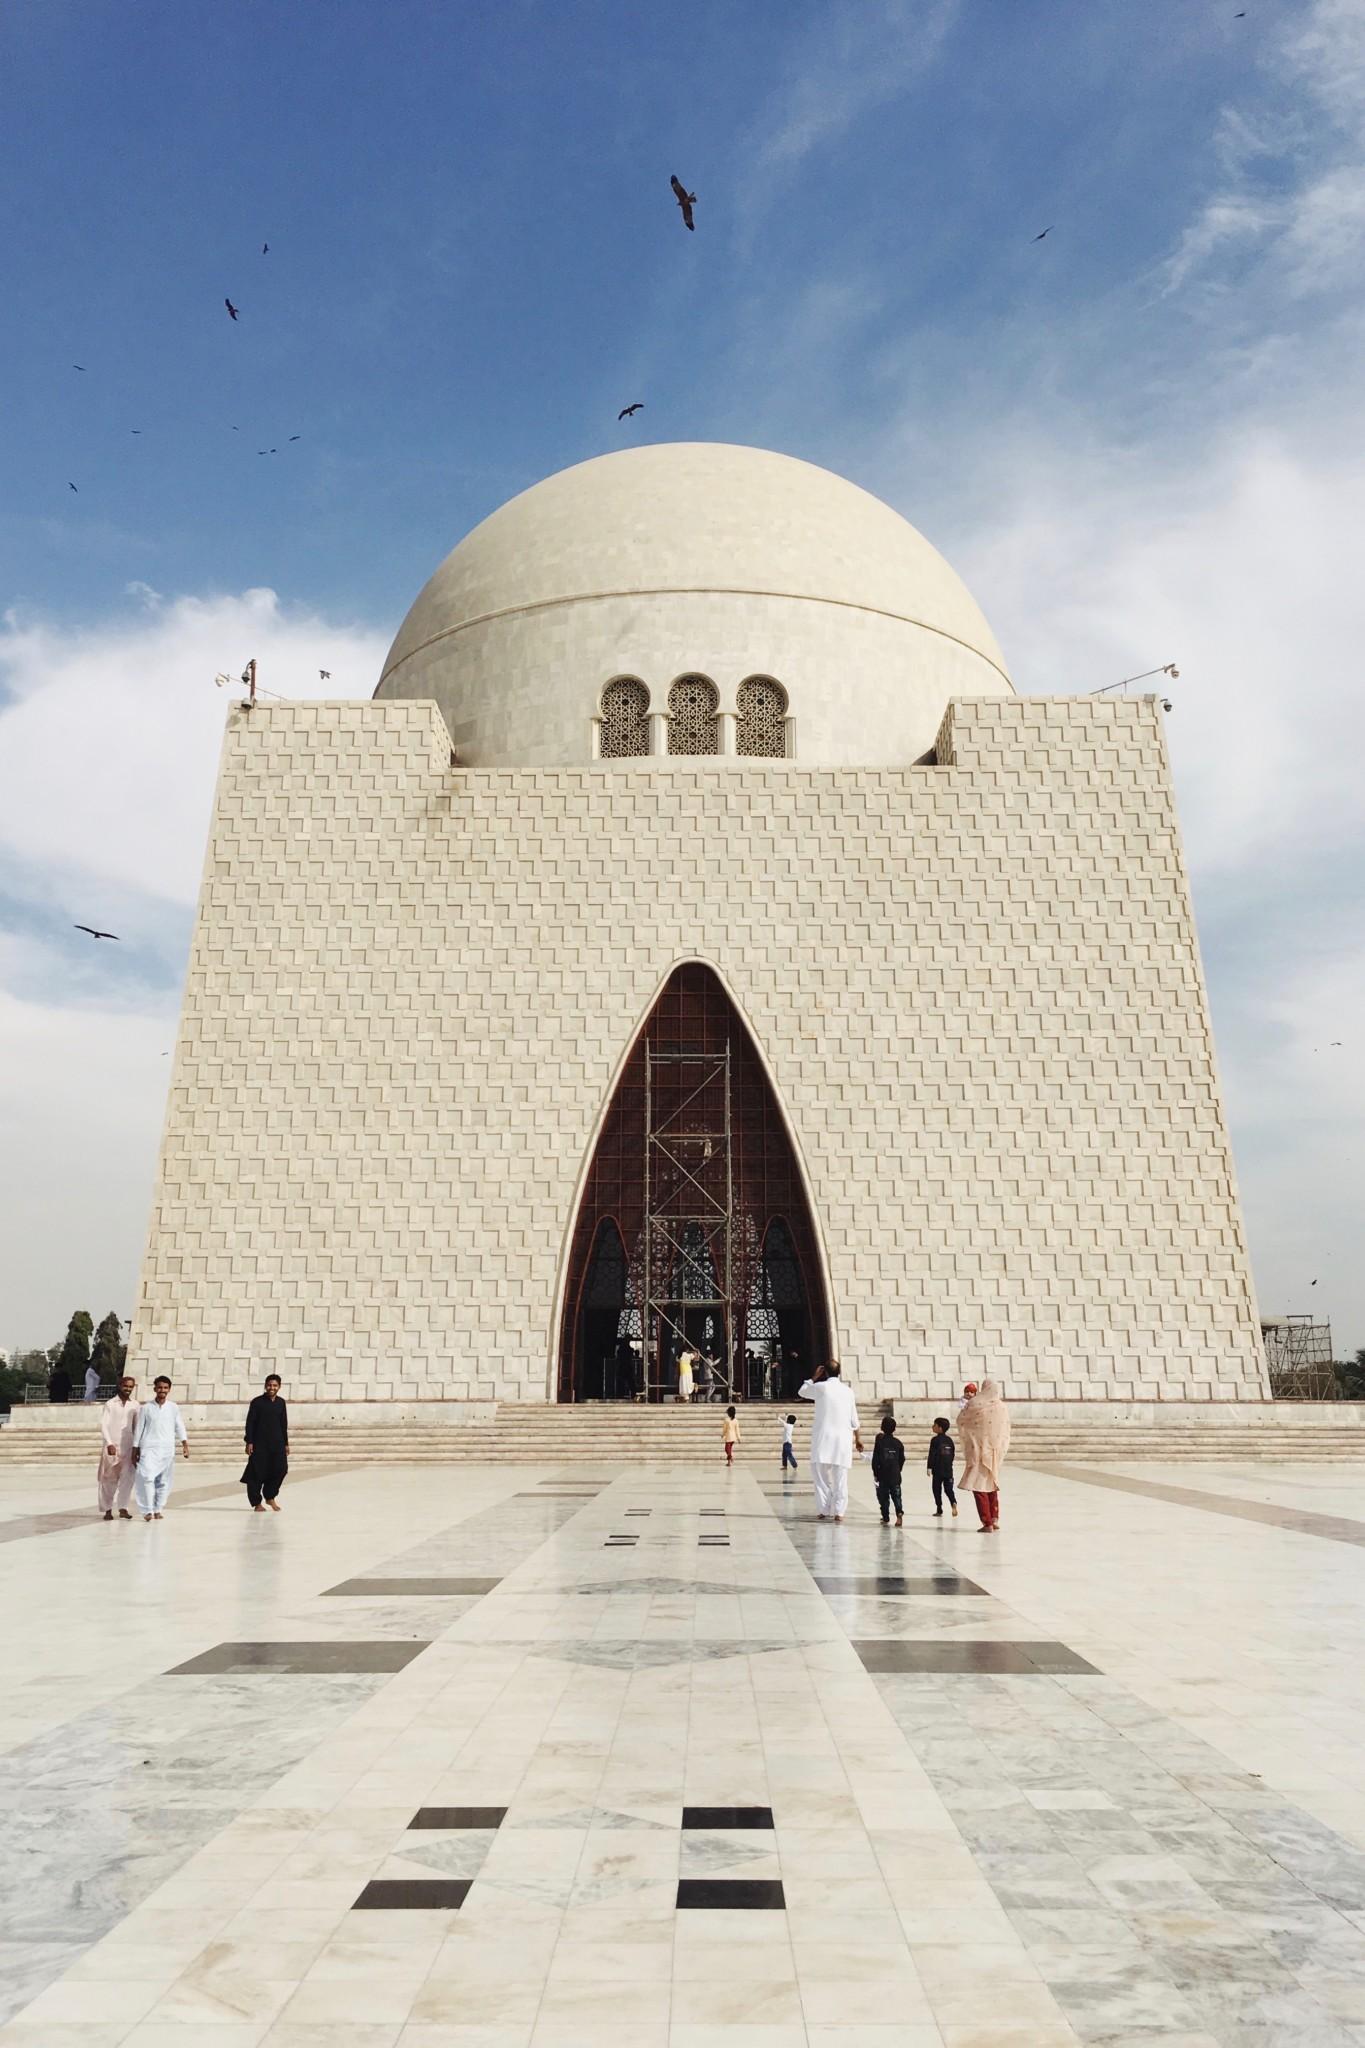 Mazar-e-Quaid Jinnah Mausoleum Karatschi